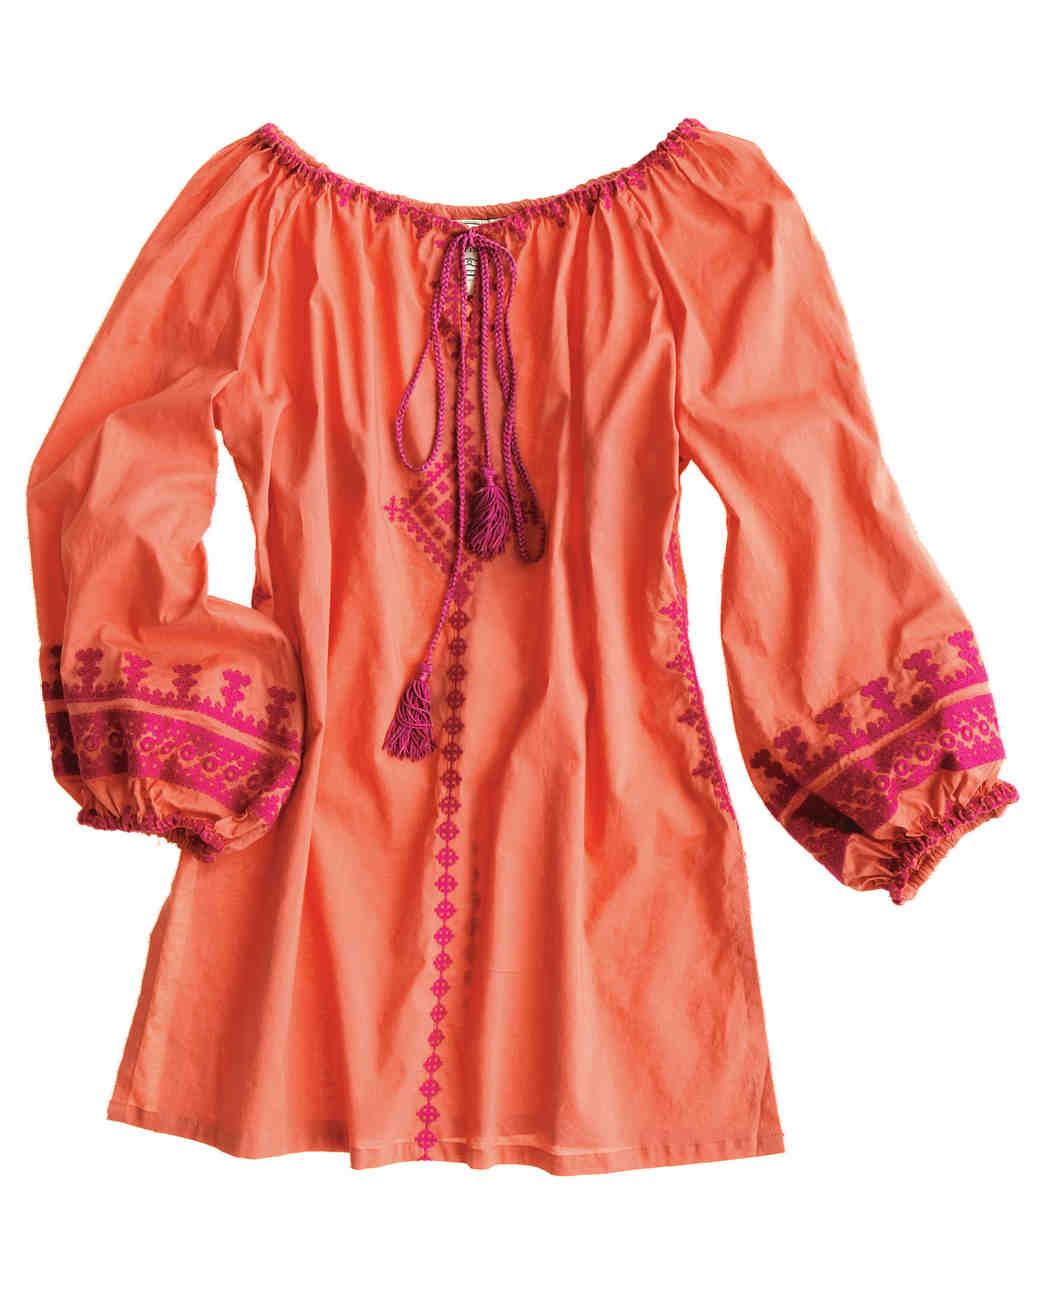 travel-accessories-orange-tunic-mwd107604.jpg